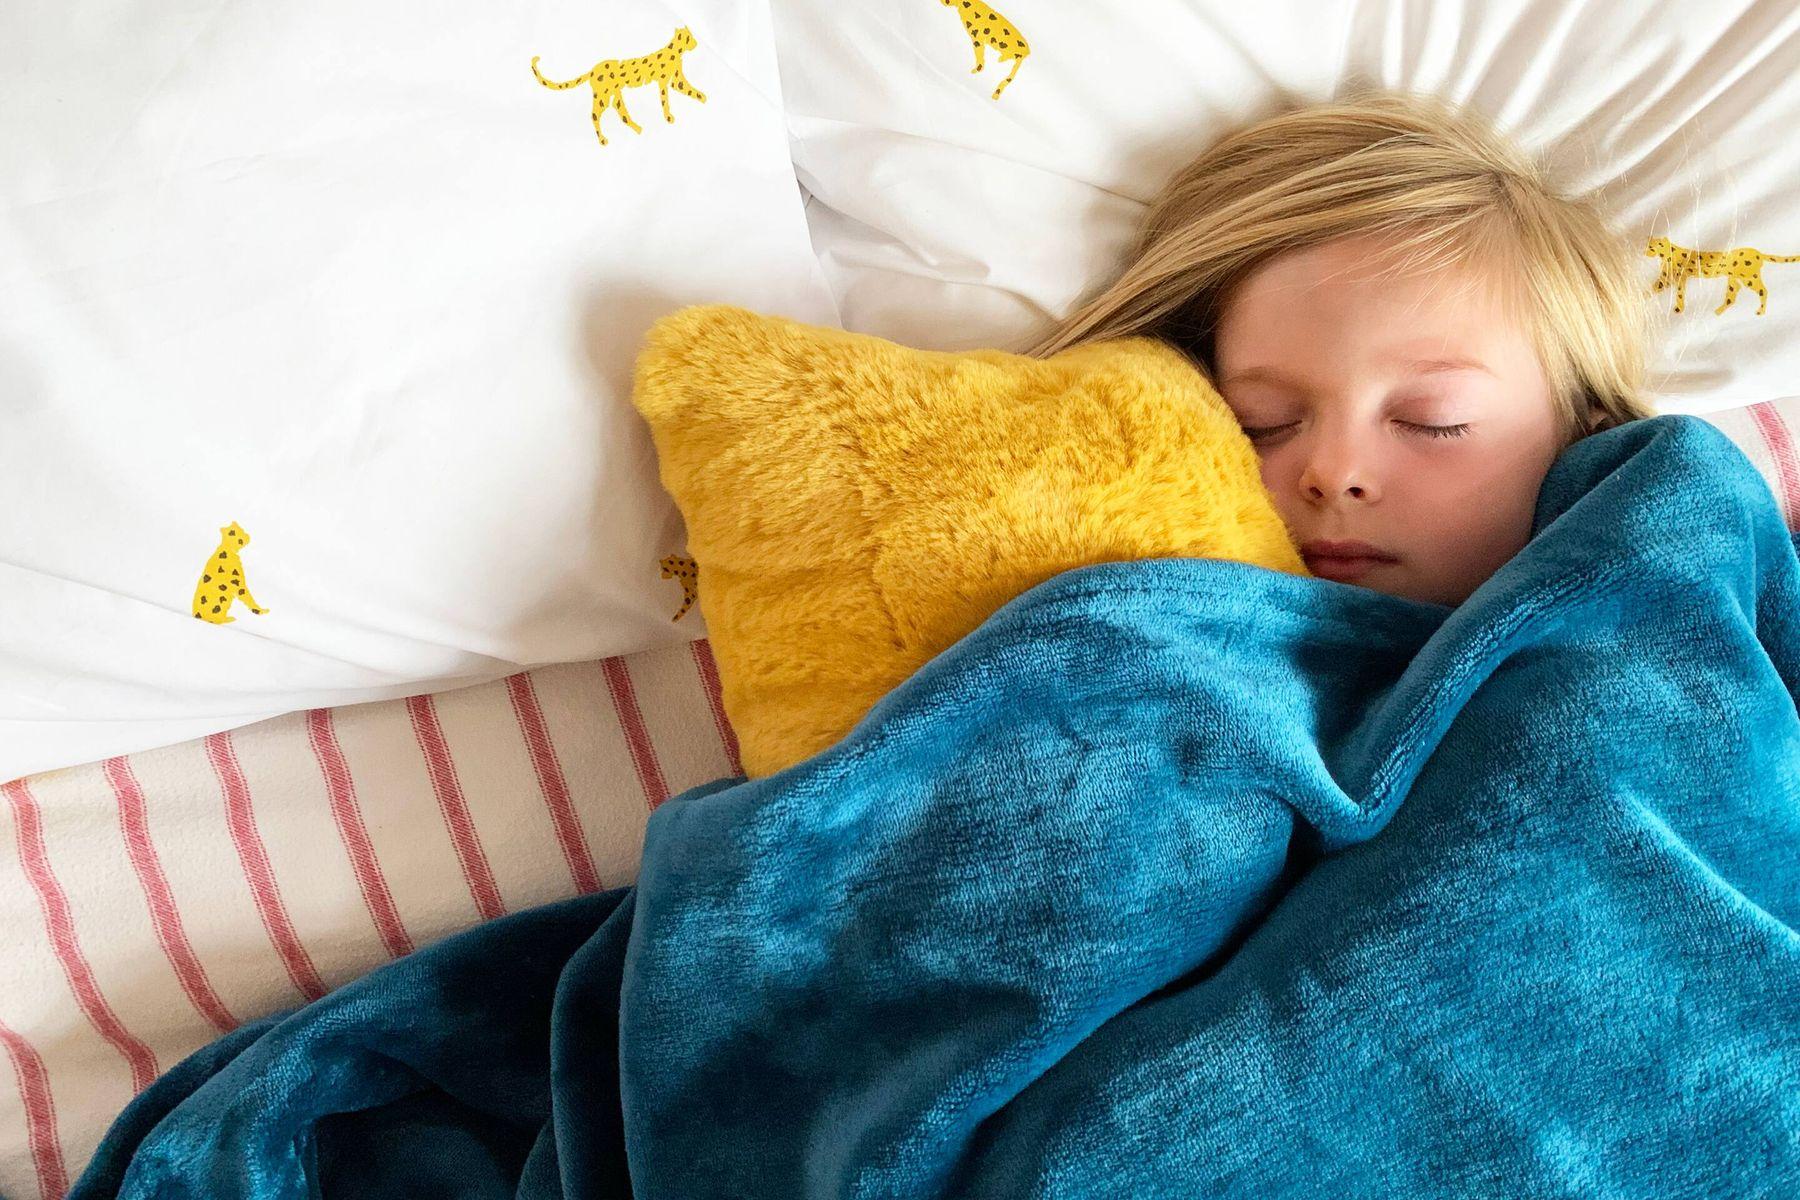 bé gái đang ngủ